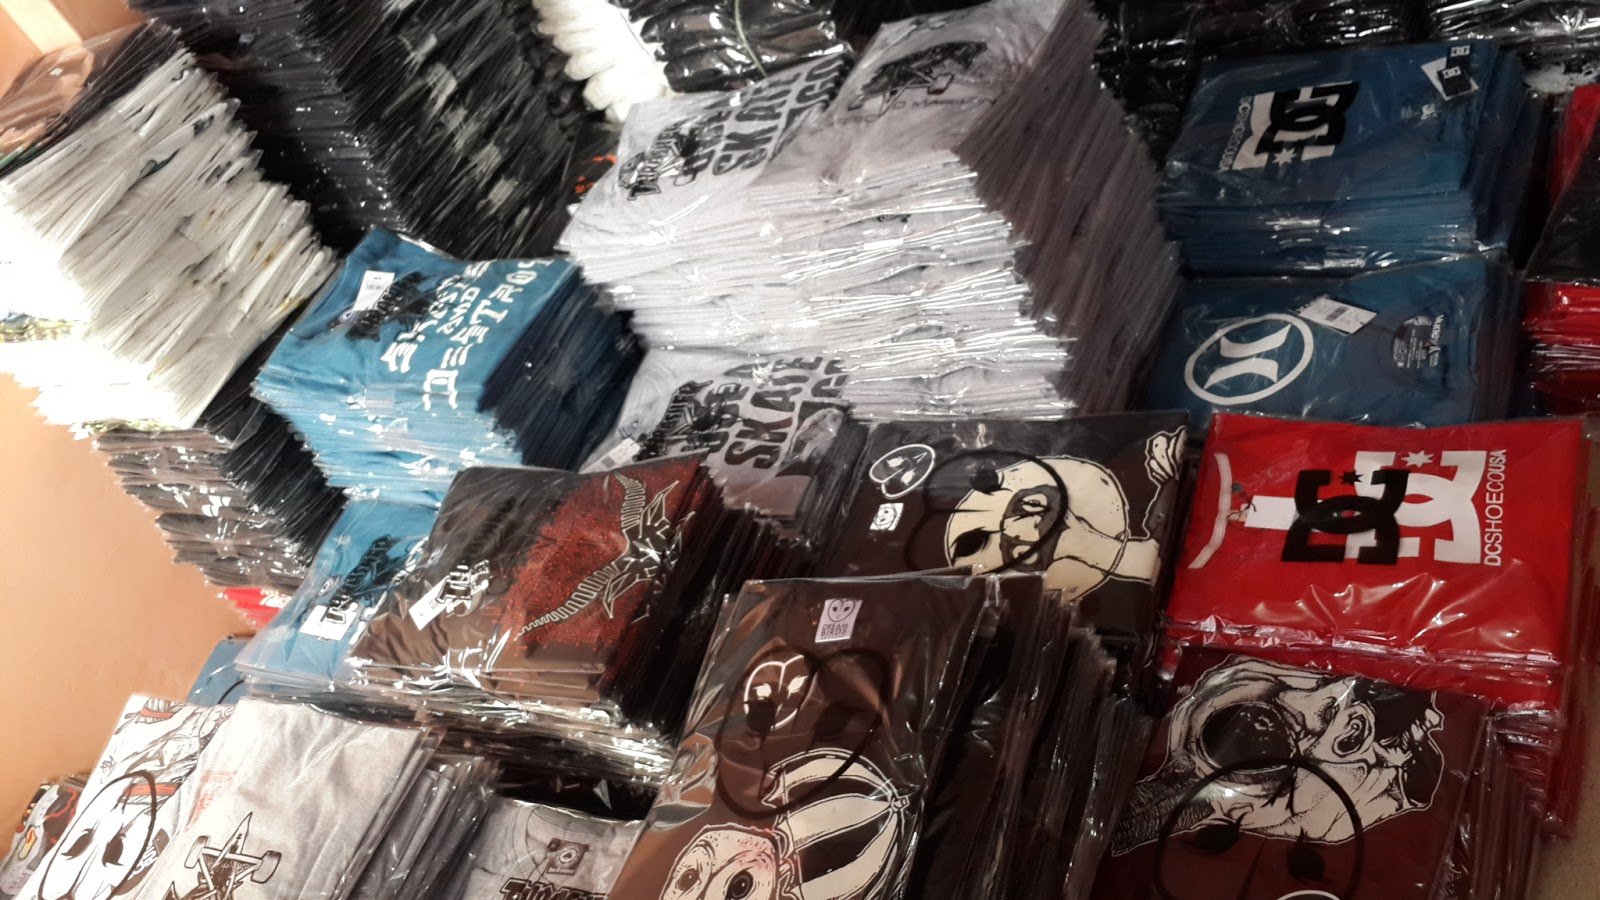 Kelebihan Kaos Distro Bandung Murah